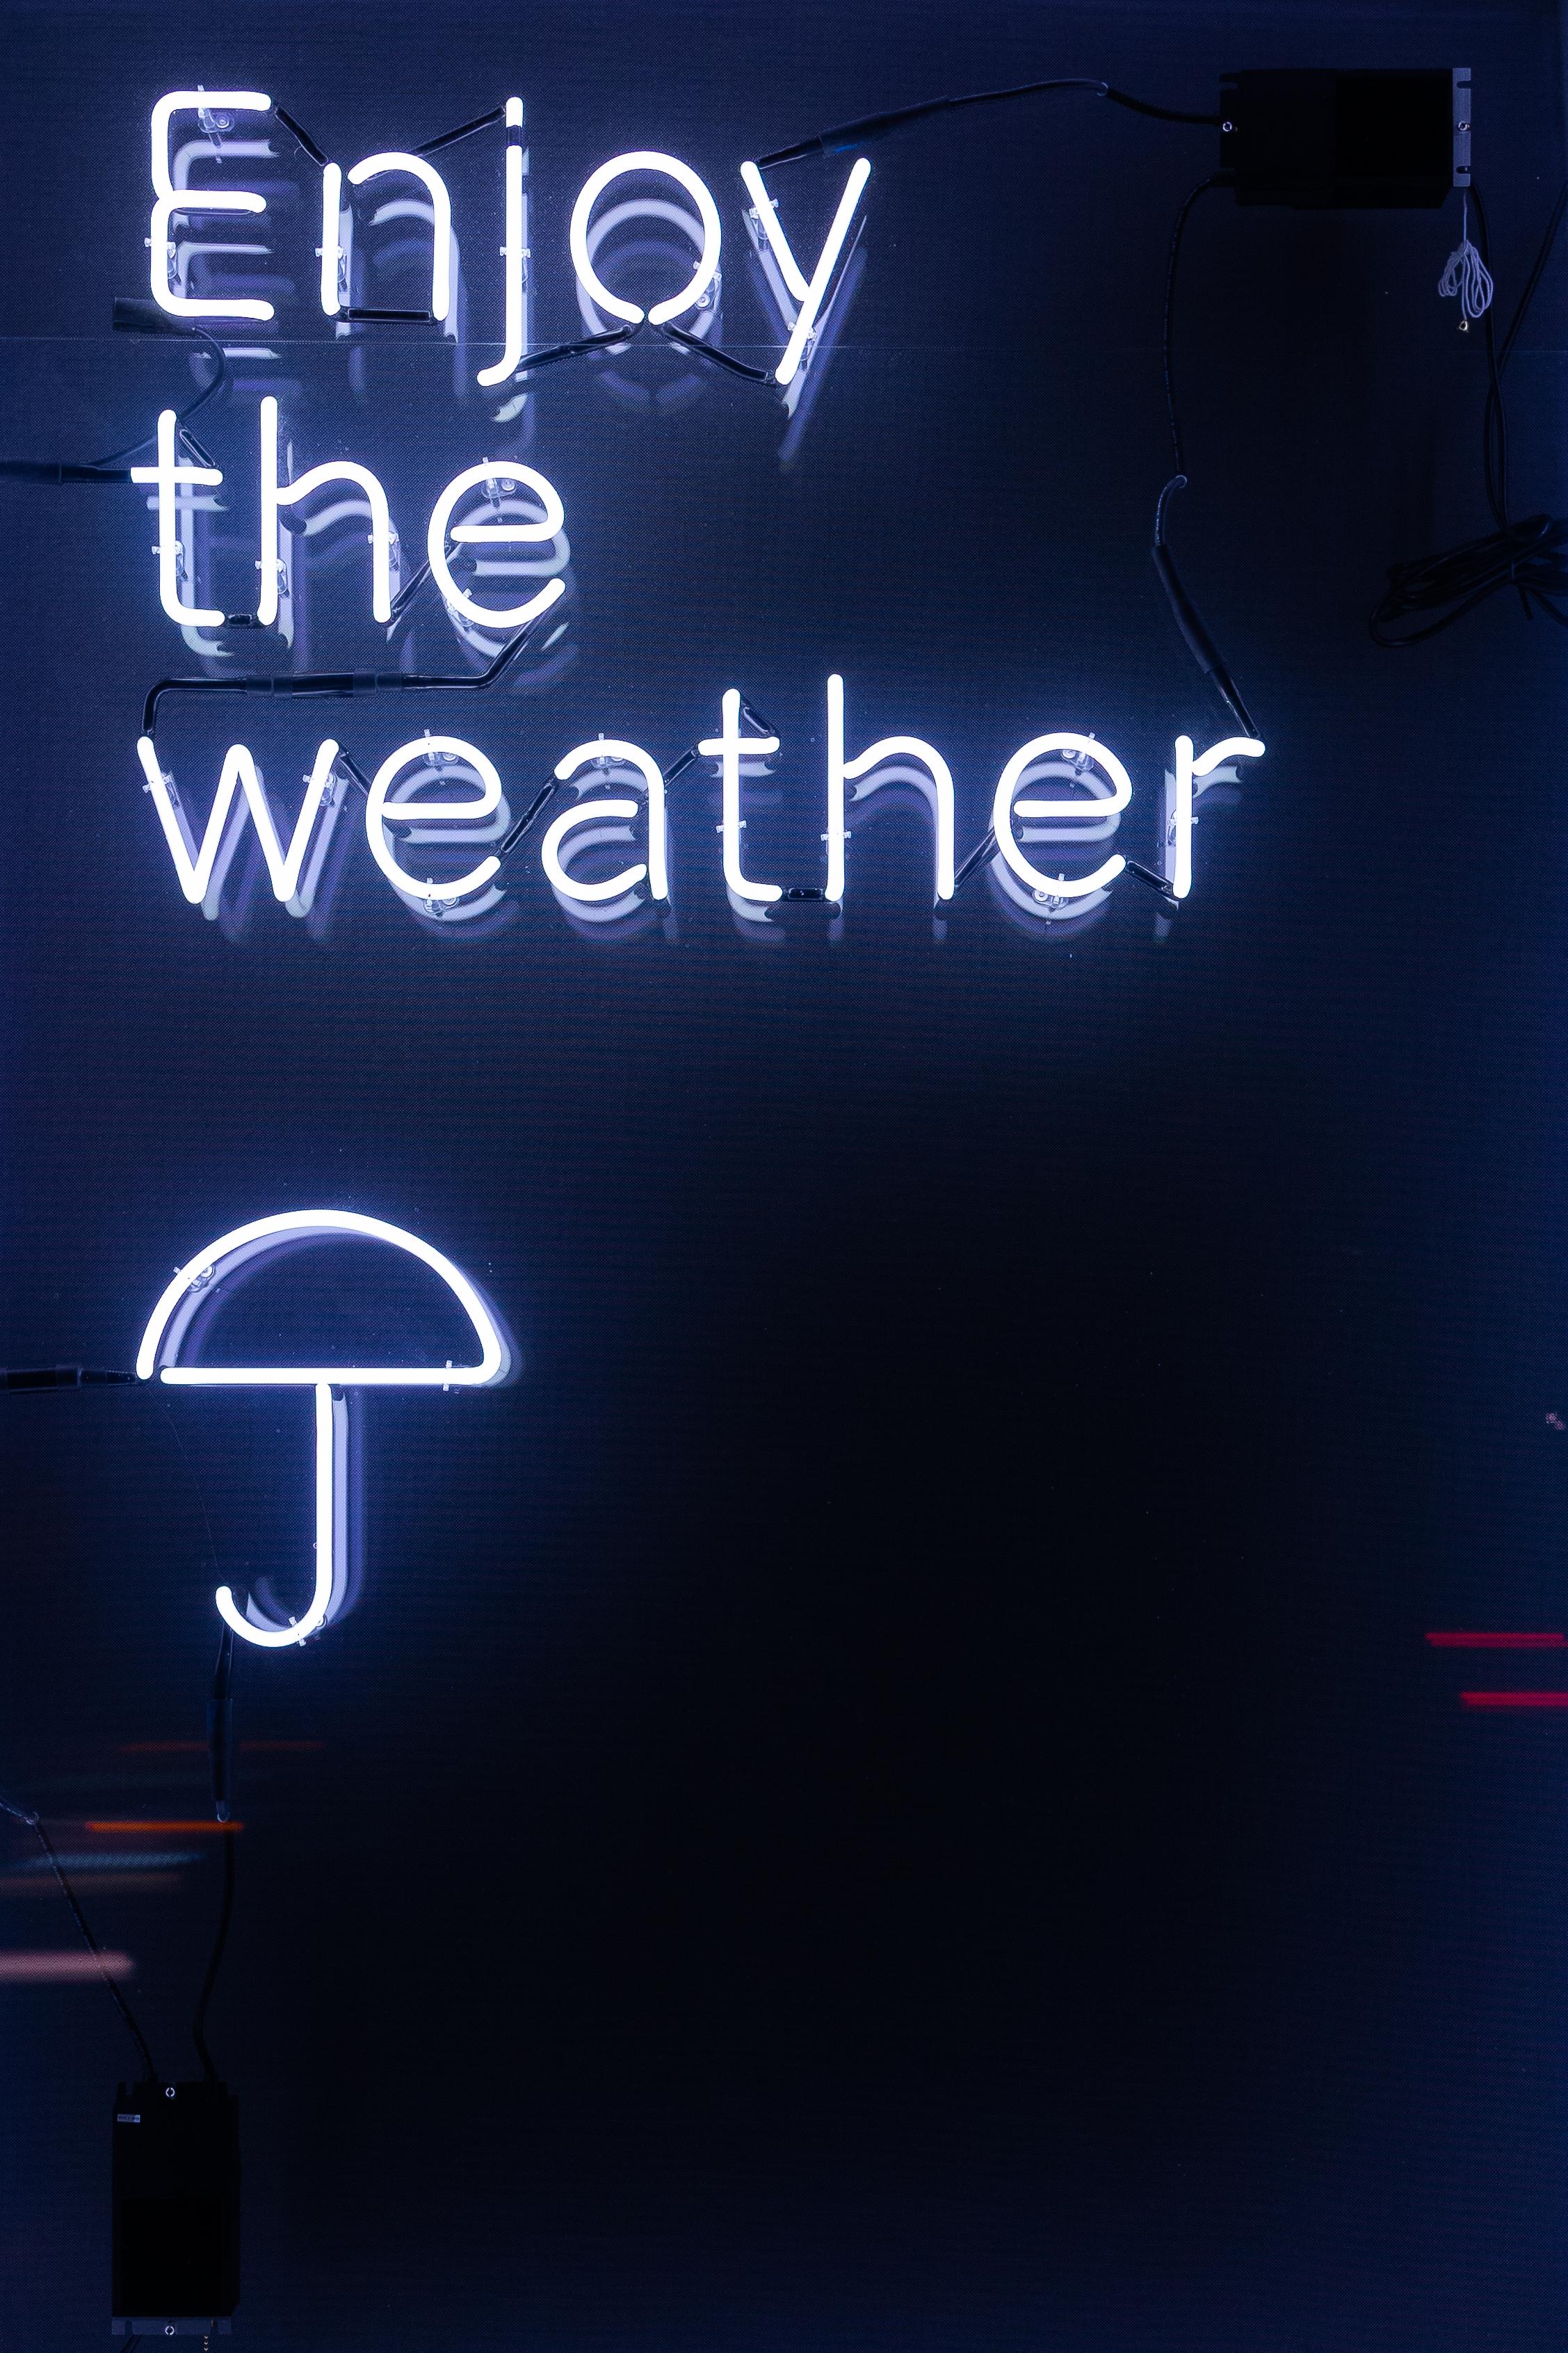 enjoy the weather - feb. 2019